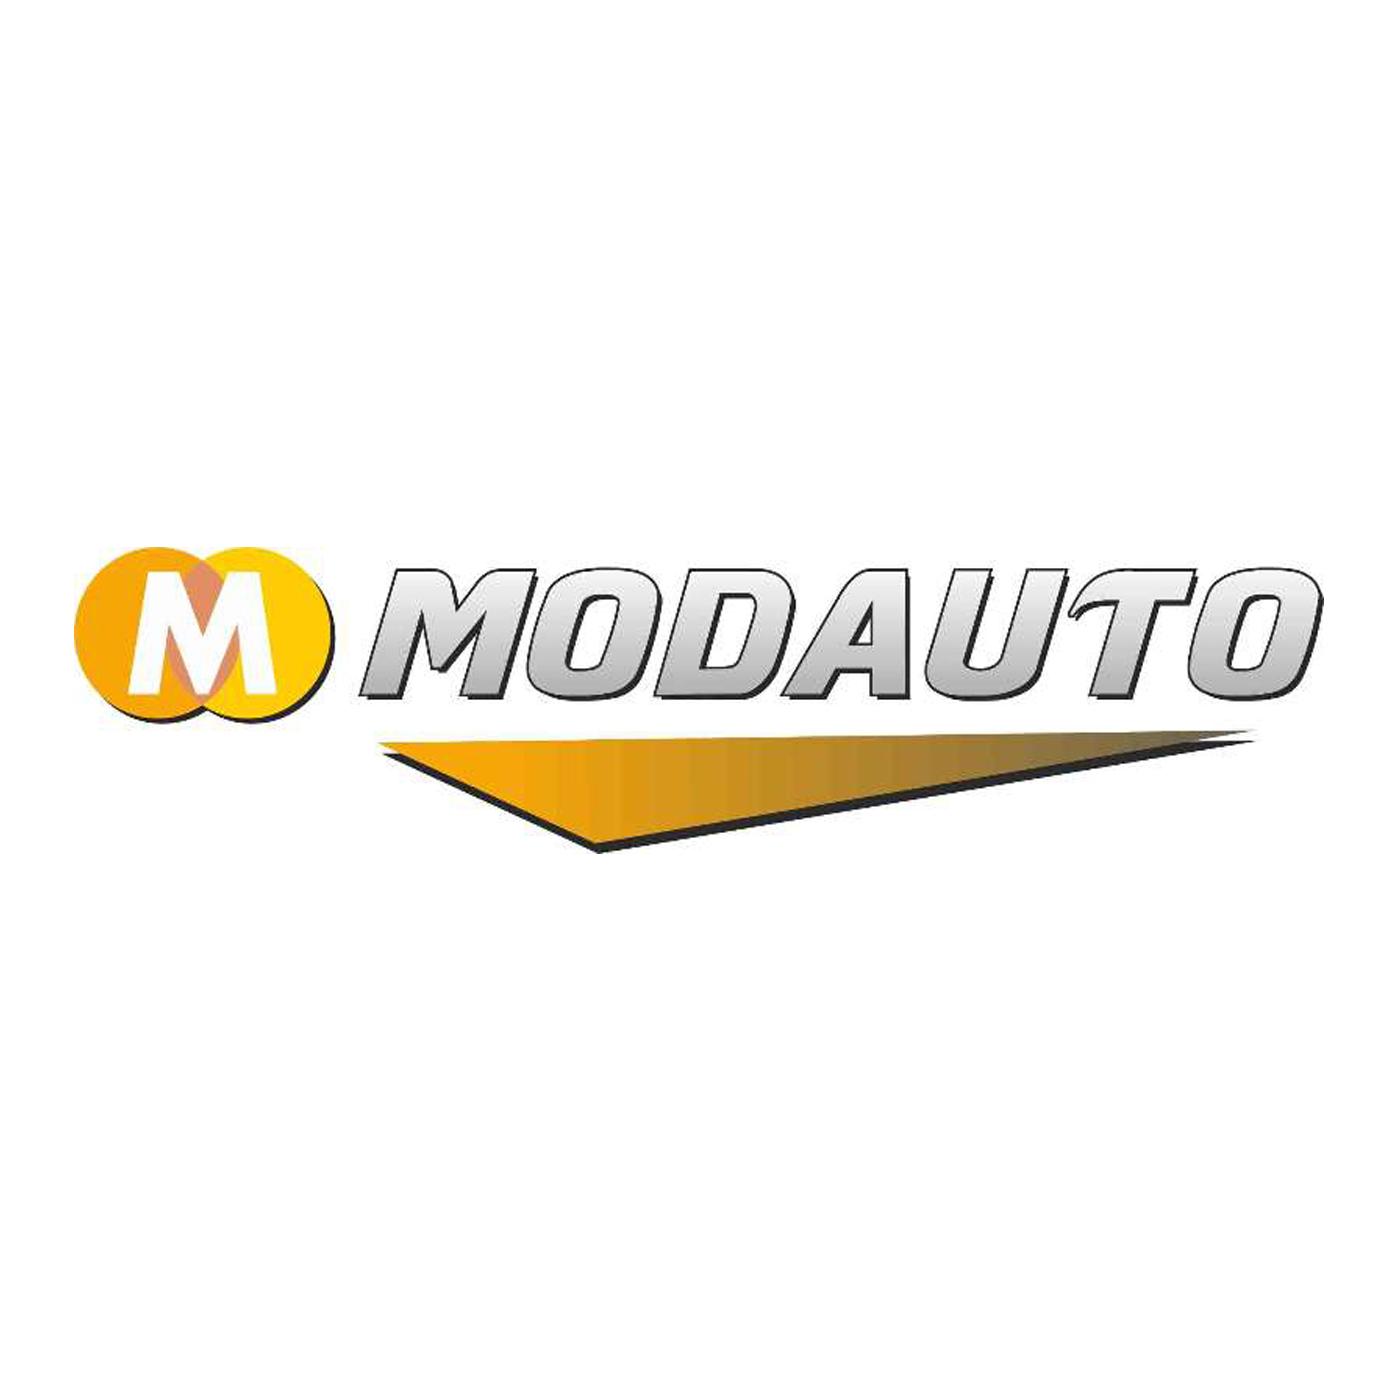 Negro Modelo Espec/ífico Designado para E39 MODAUTO Alfombrillas de Goma para Coche Modelo T132 5 Unidades Incluidos